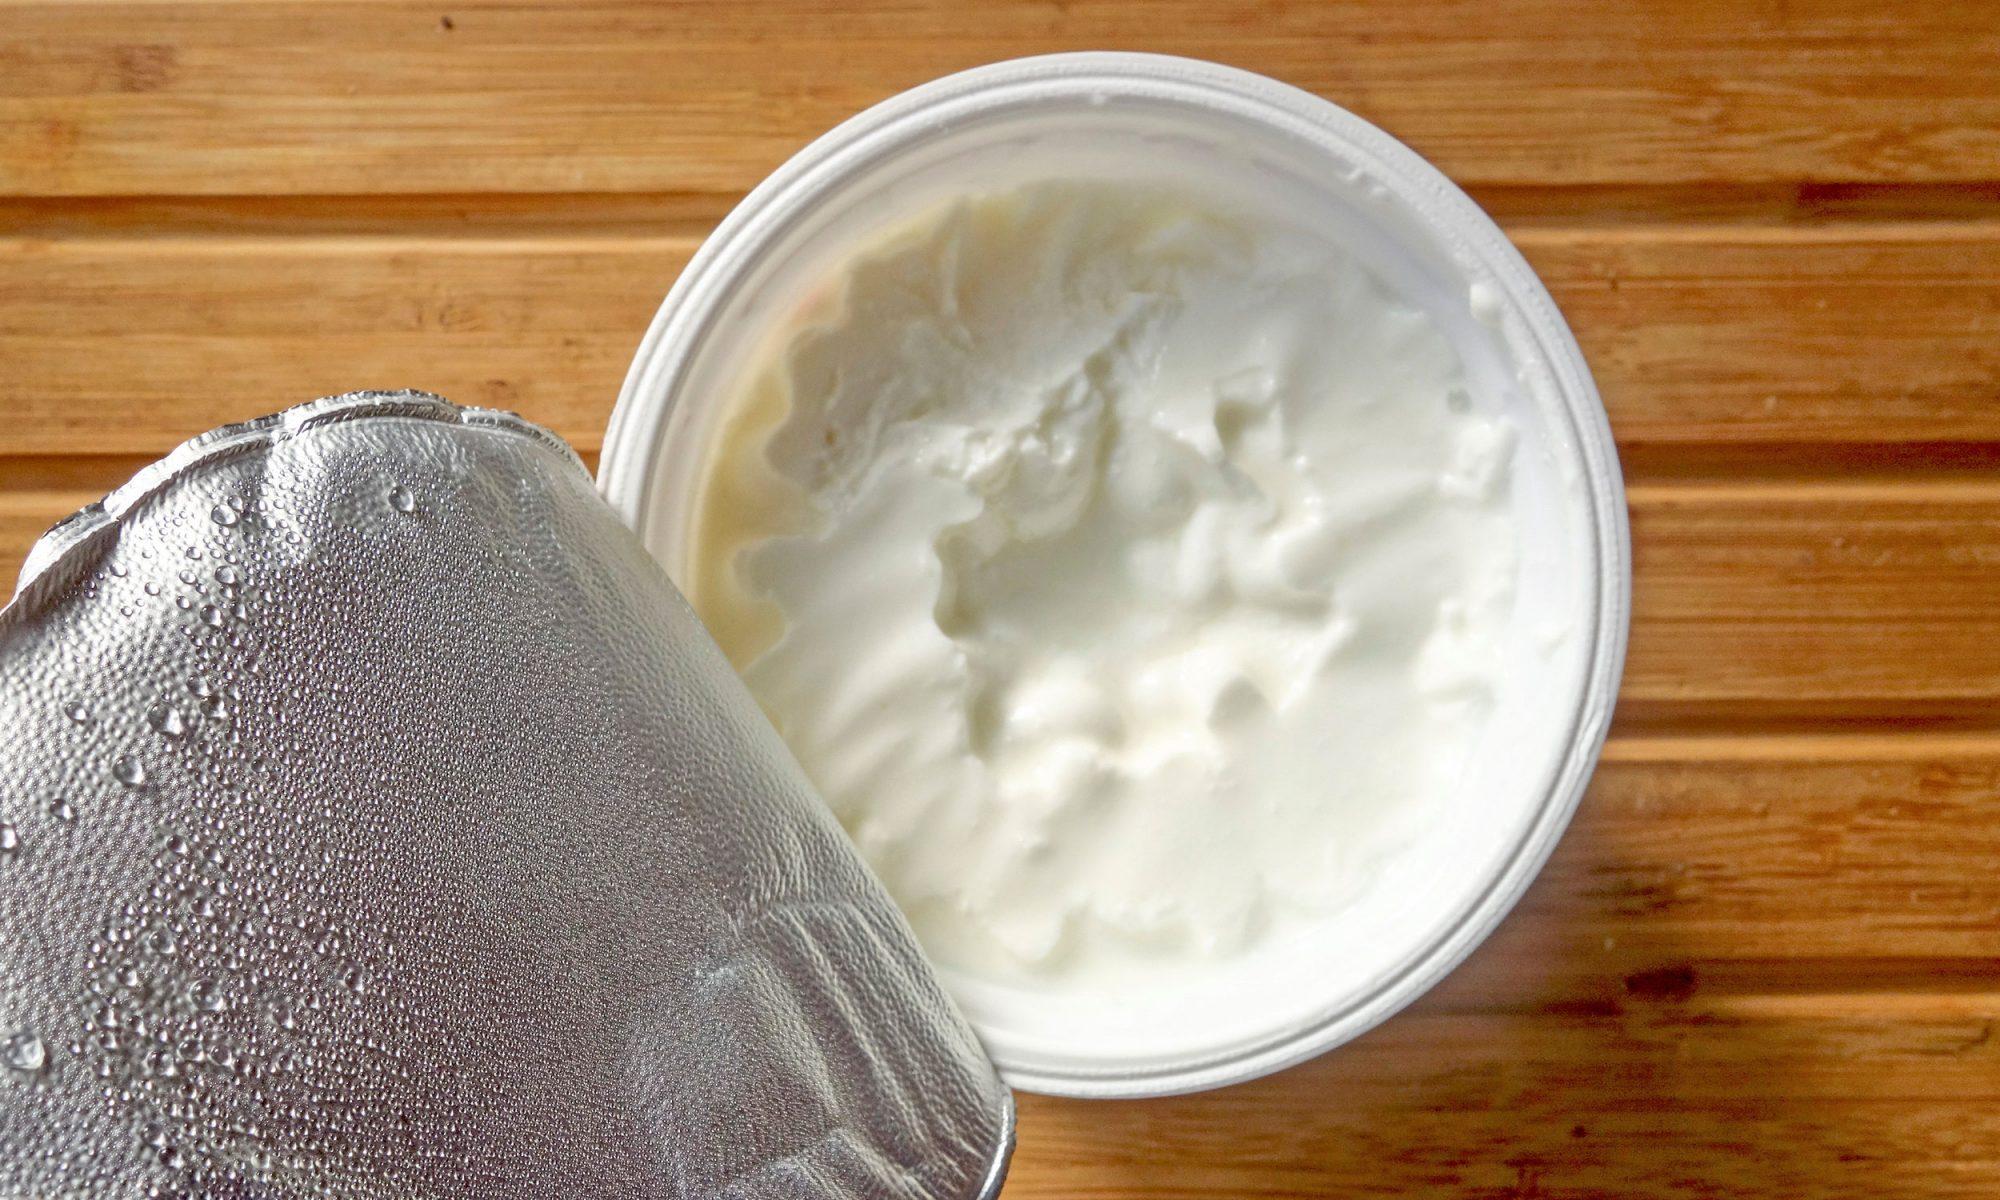 EC: Yogurt Bacteria May Reduce Depression Symptoms